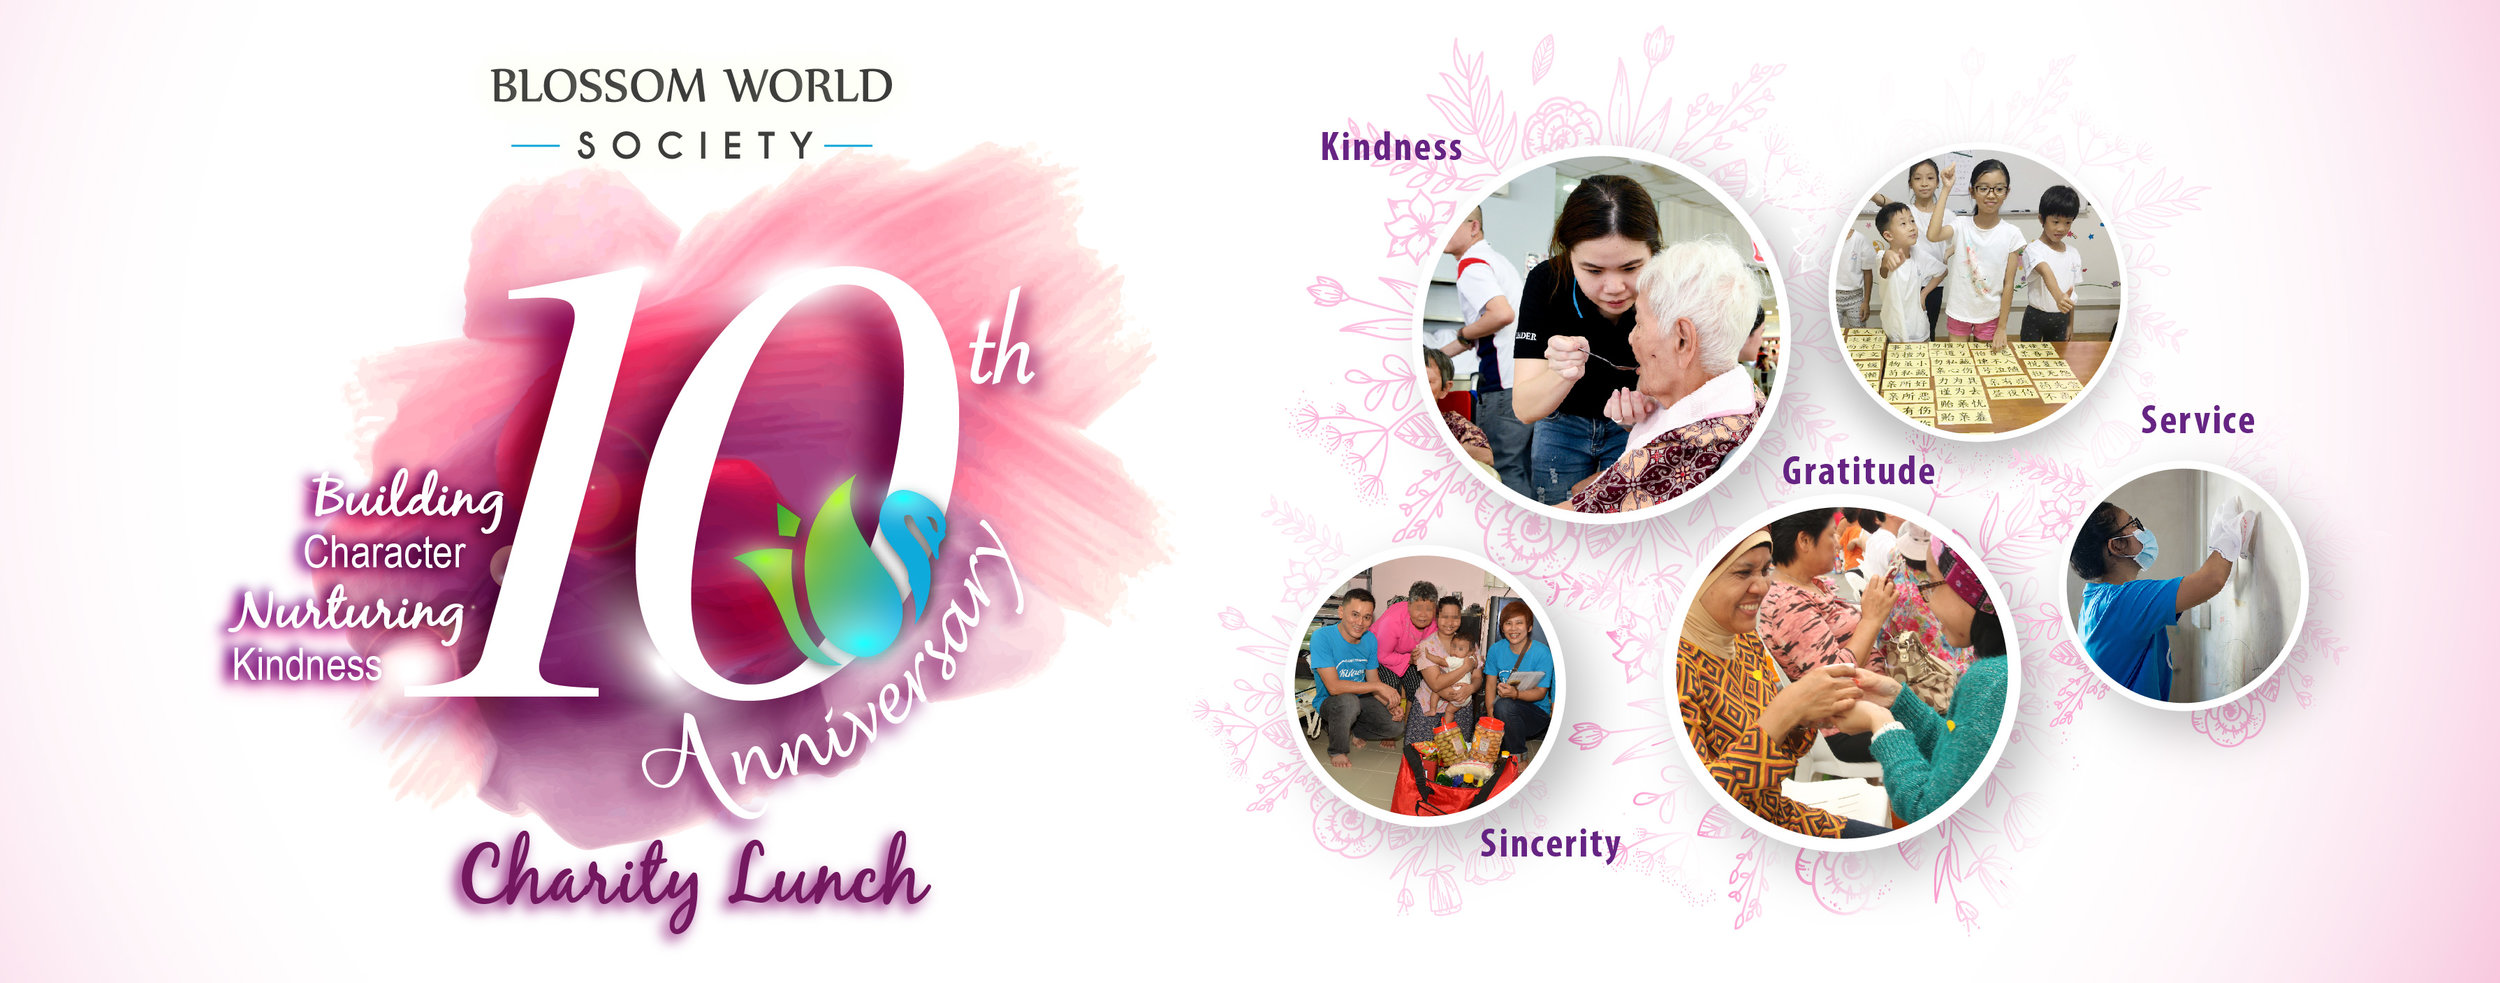 Charity Lunch banner-01.jpg